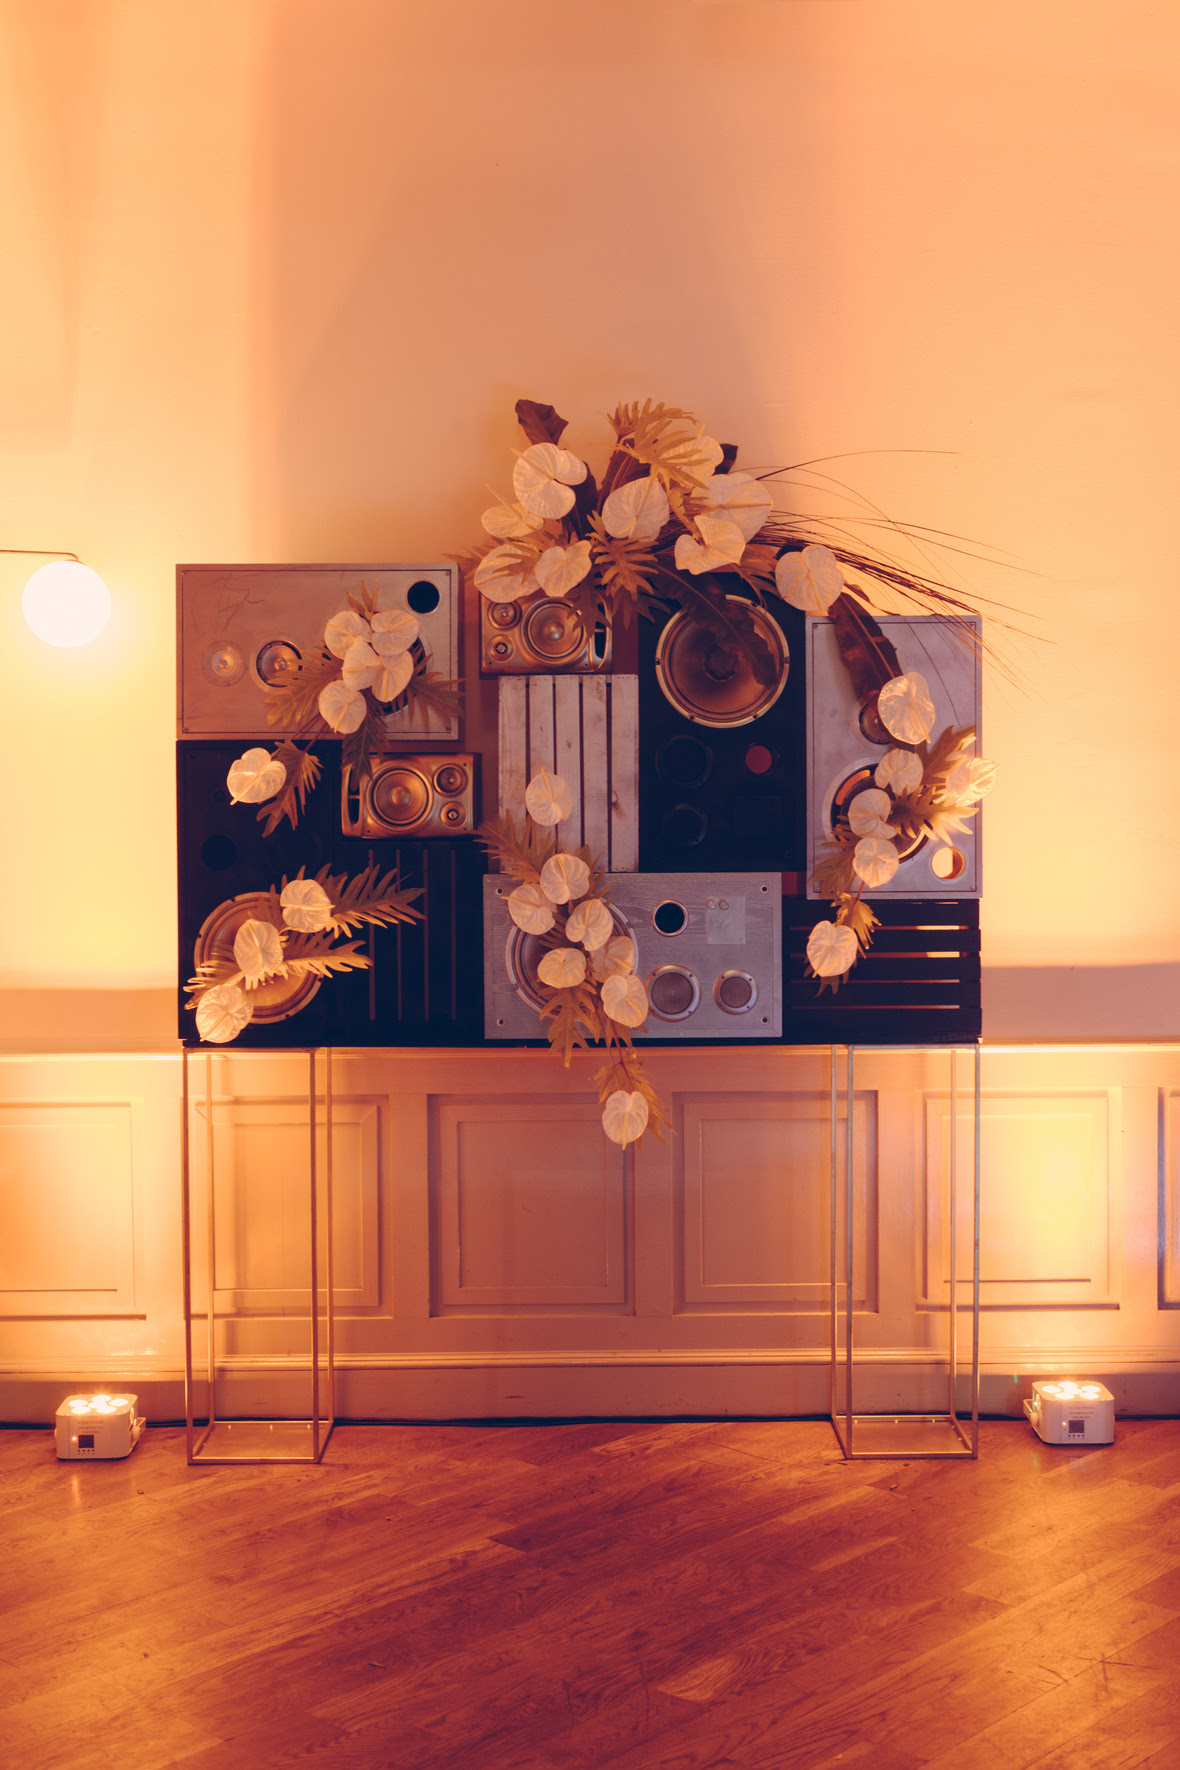 Event design and speaker art installation by Anne Kilcullen of Blade.